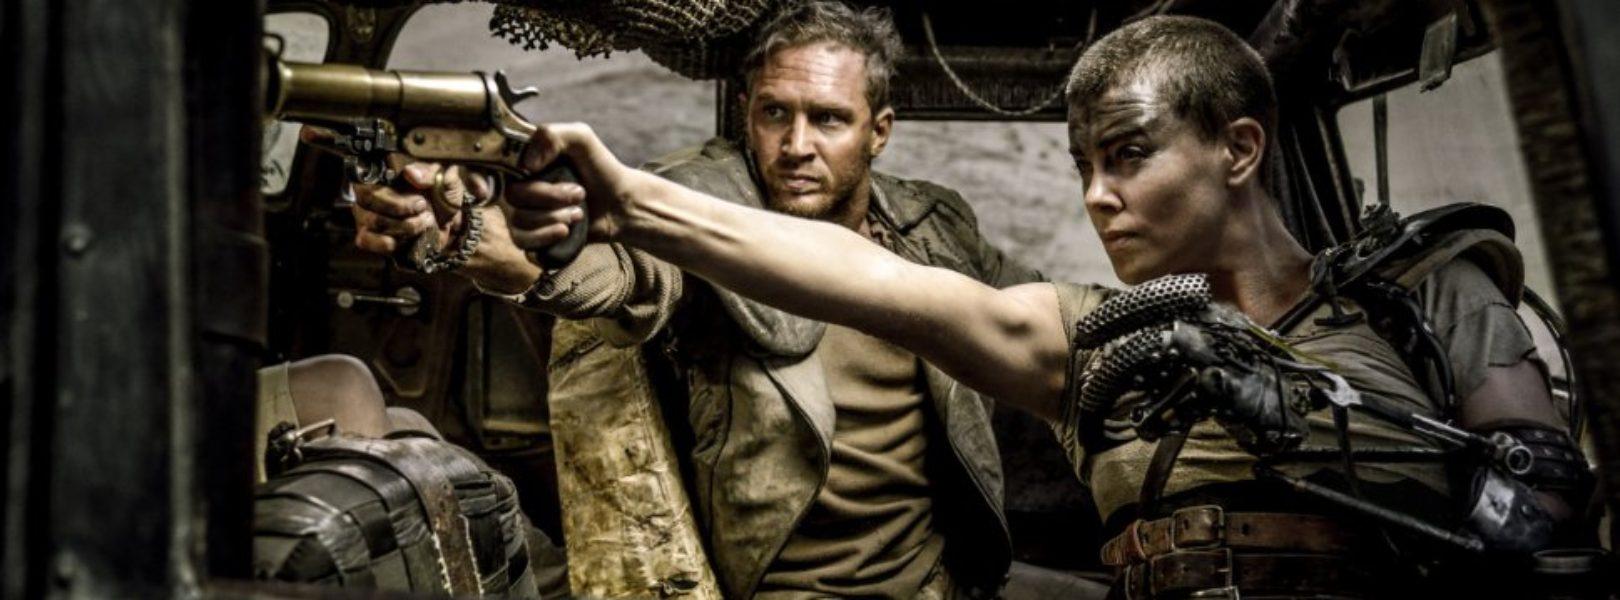 Mad Max Fury Road 2015 1 1620x600 1